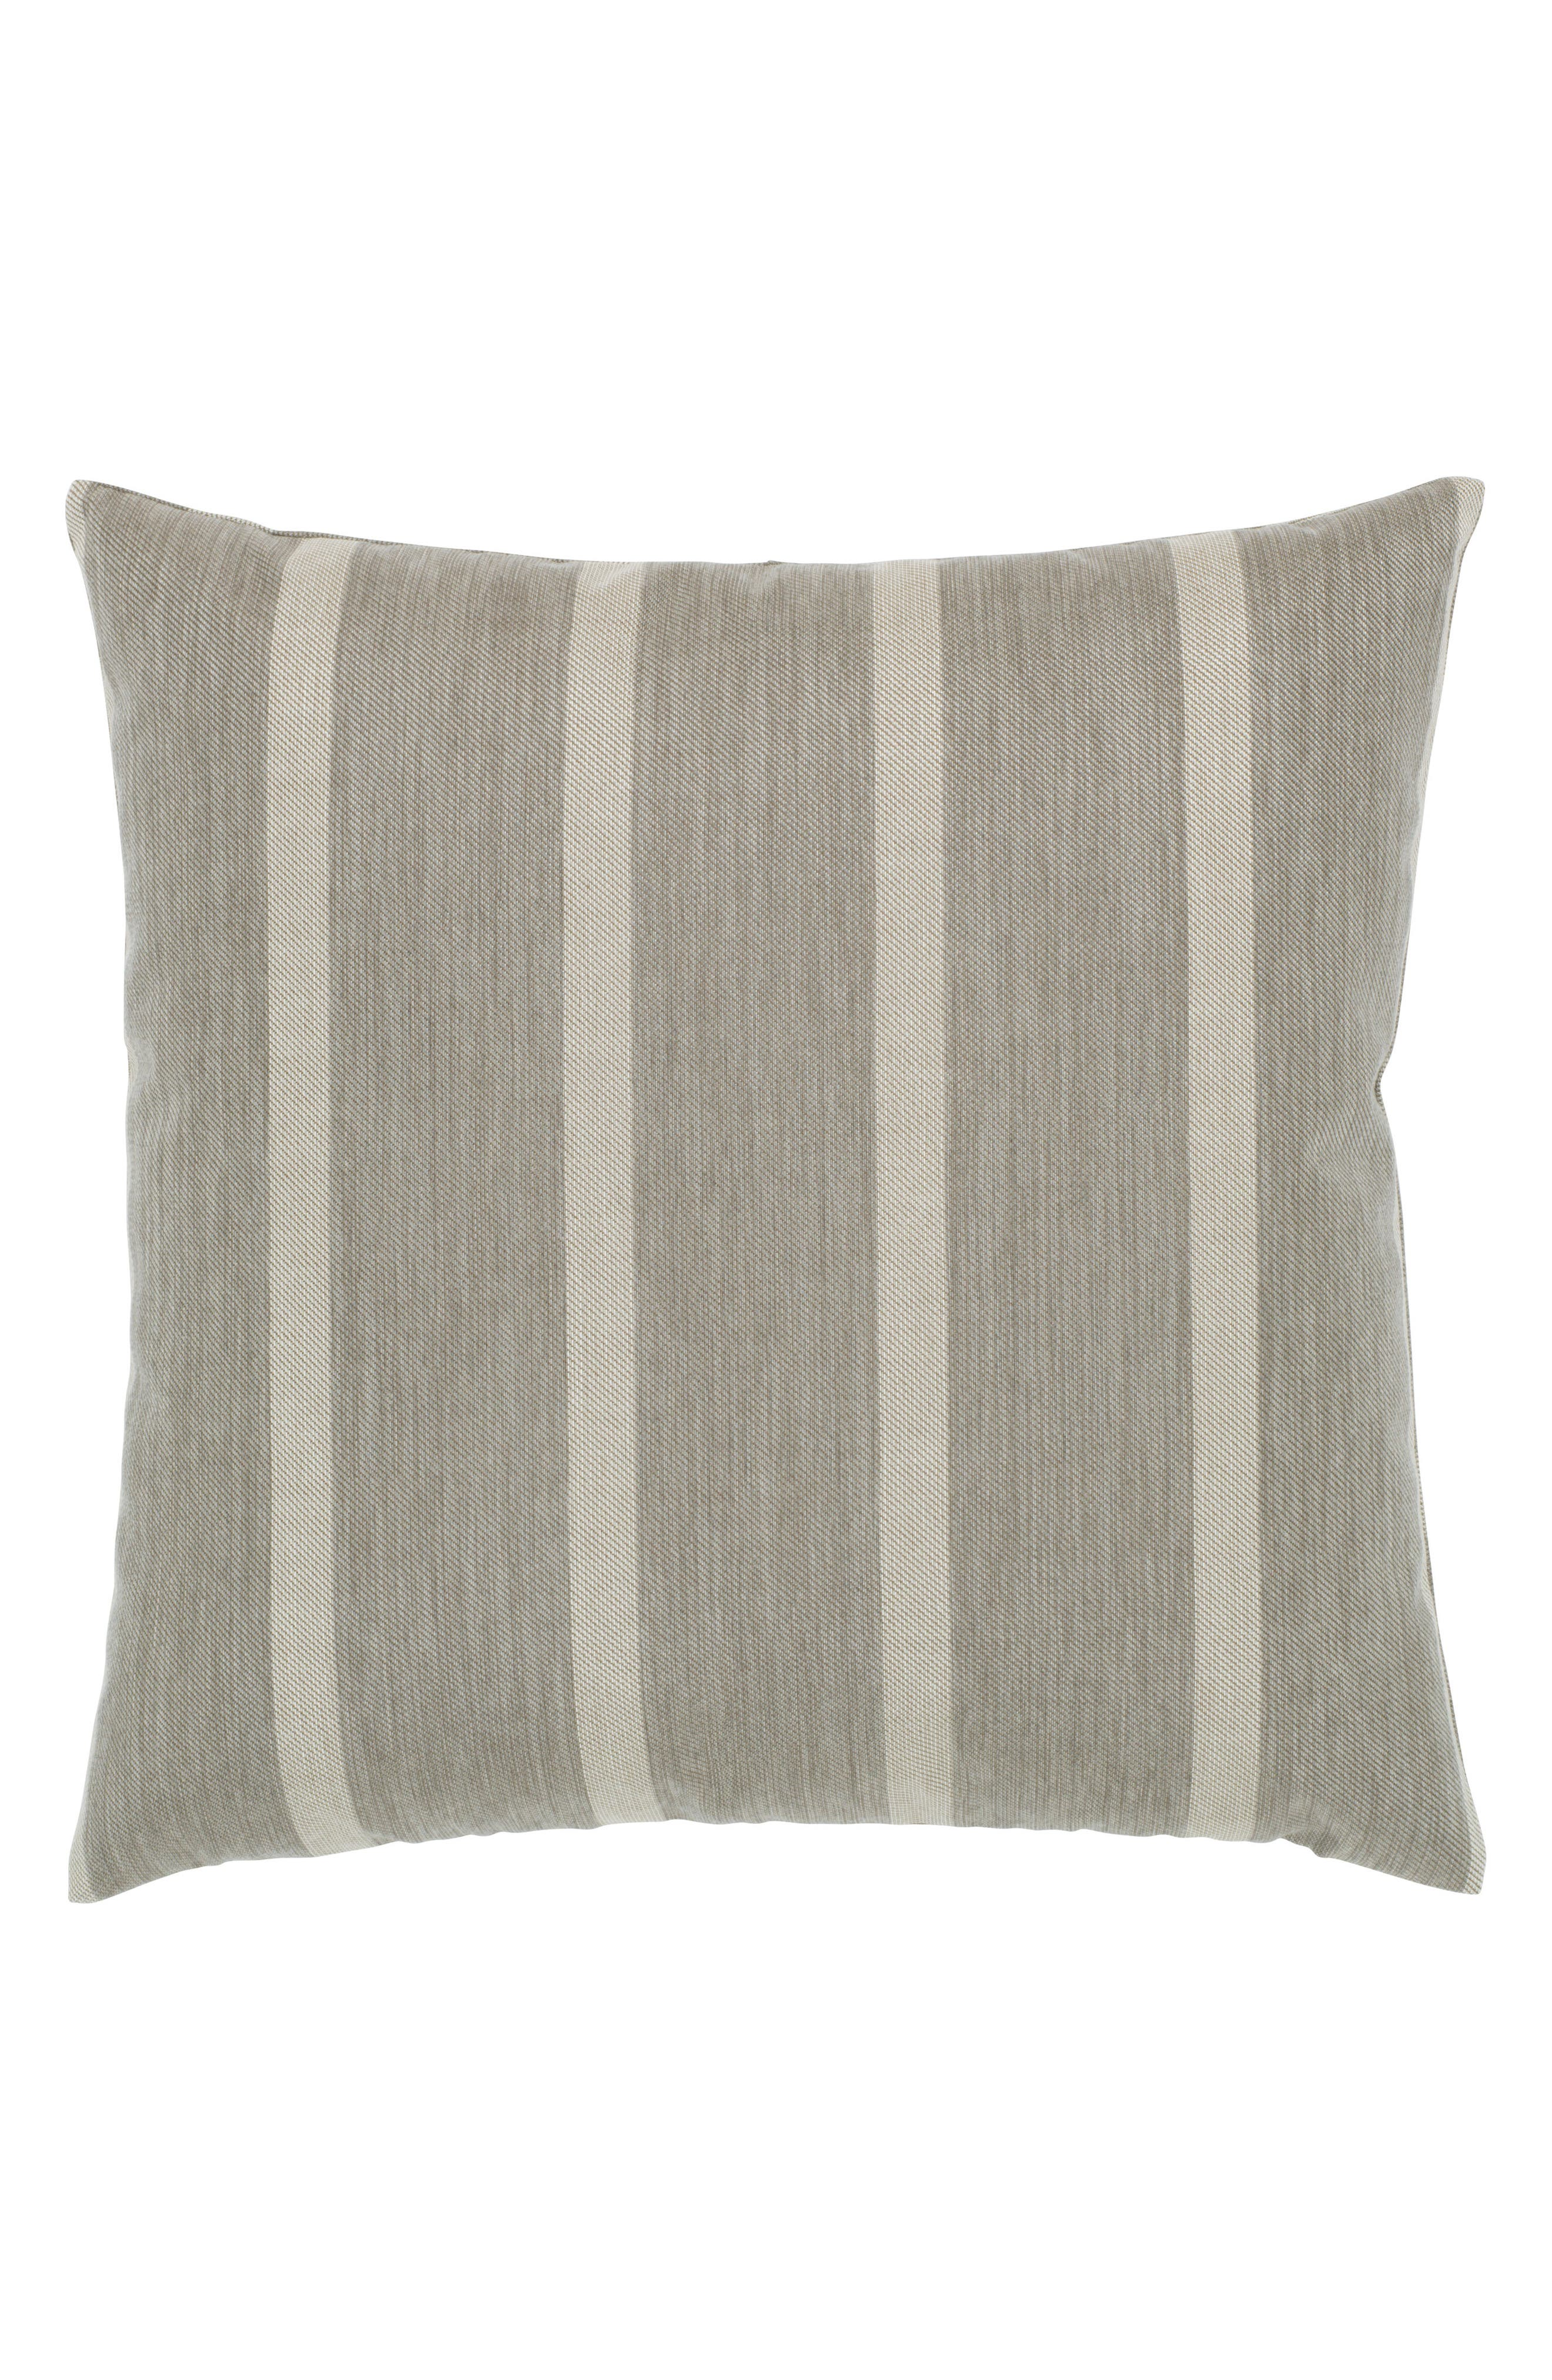 Sparkle Chevron Indoor/Outdoor Accent Pillow,                             Alternate thumbnail 3, color,                             Grey